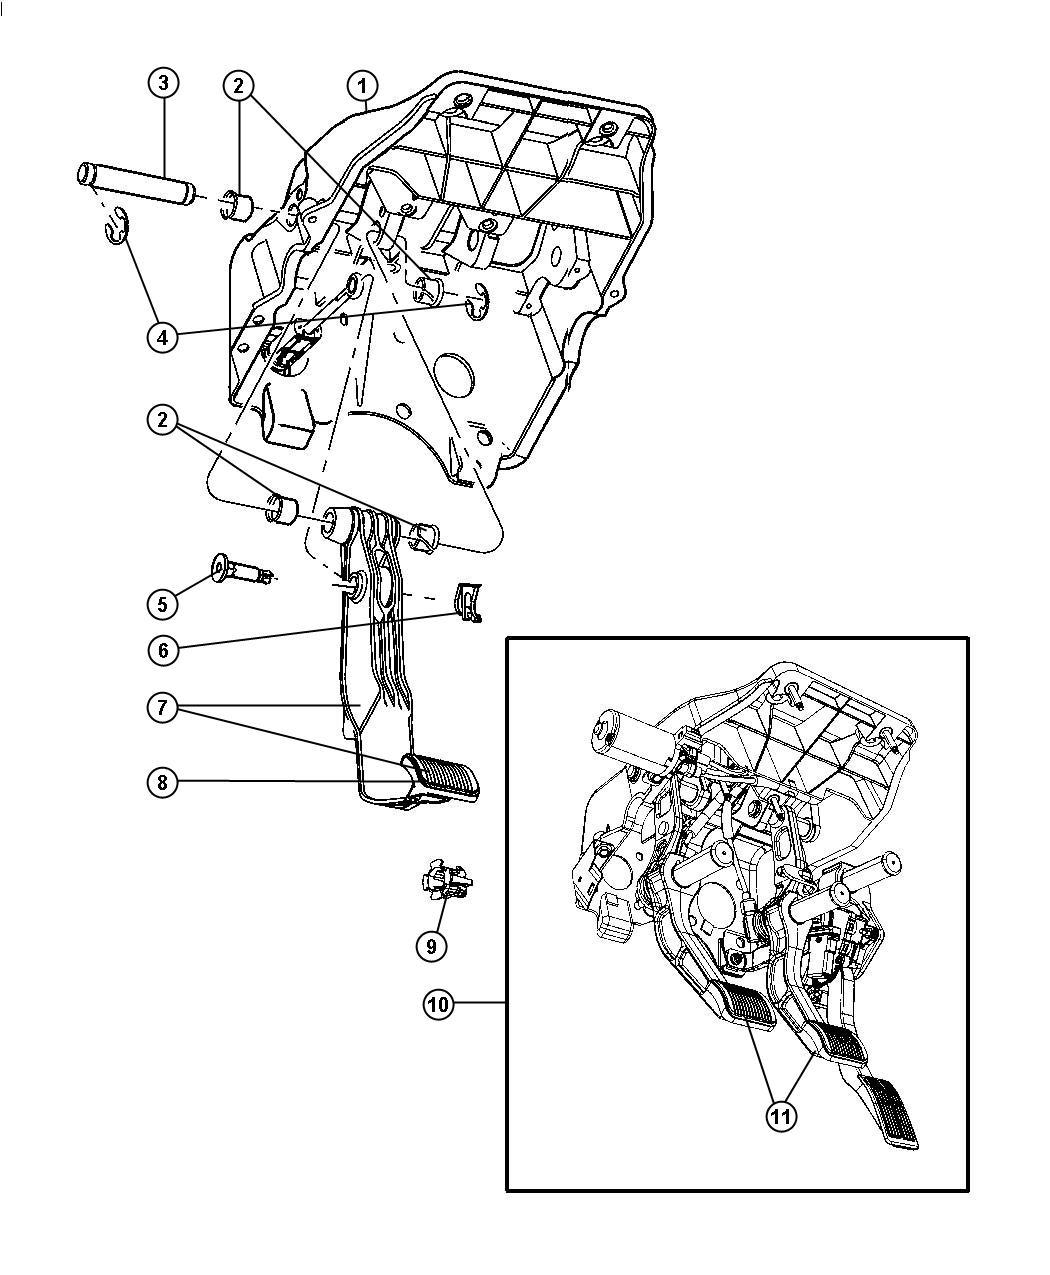 pedalbrakepower adjustable xap fits dodge ram 2500 2009